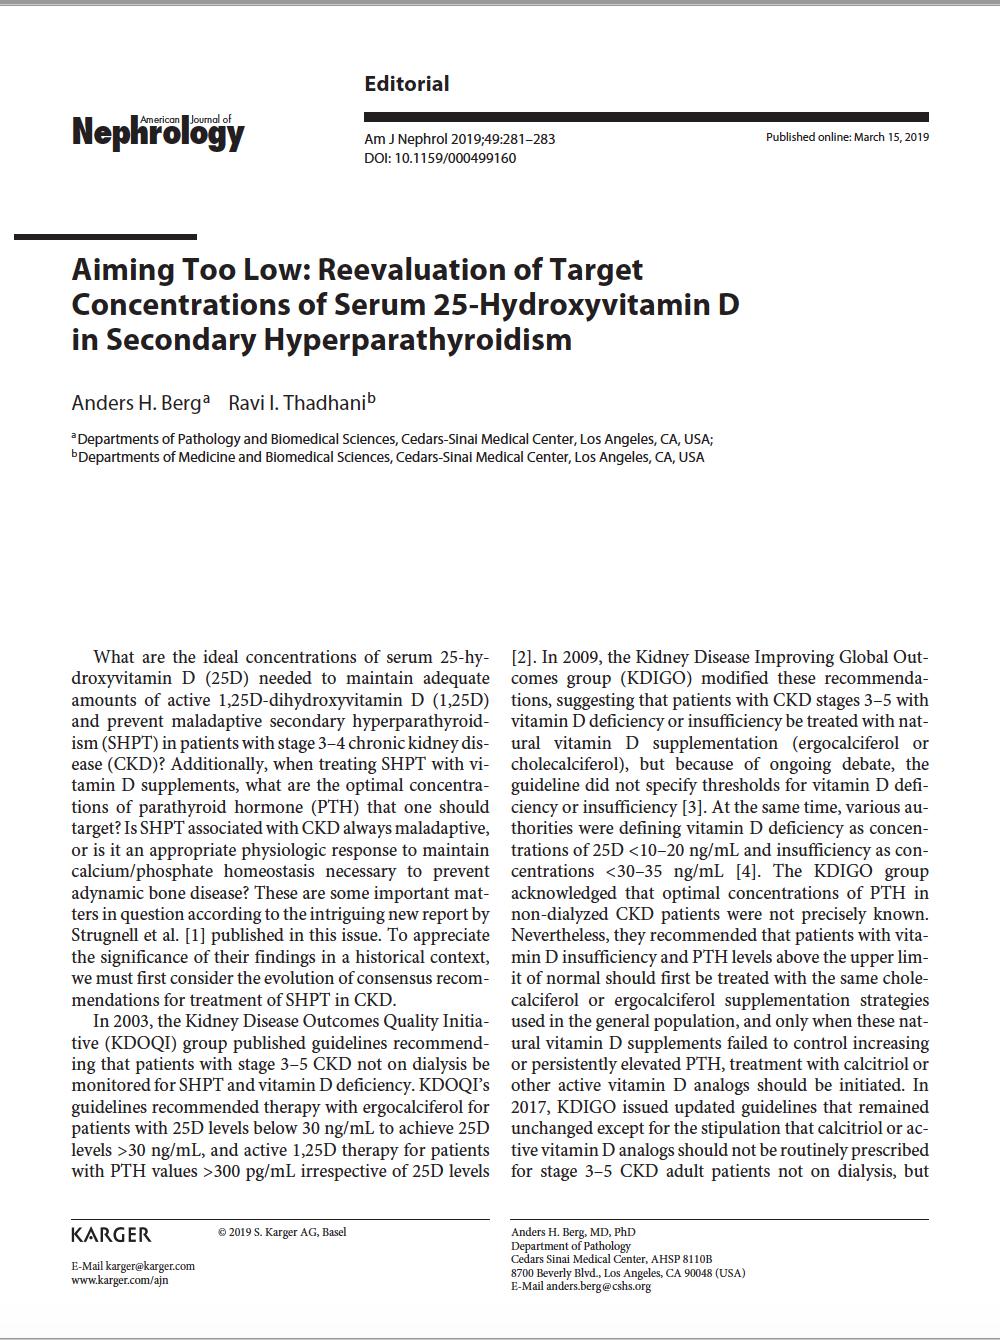 PDF image of article